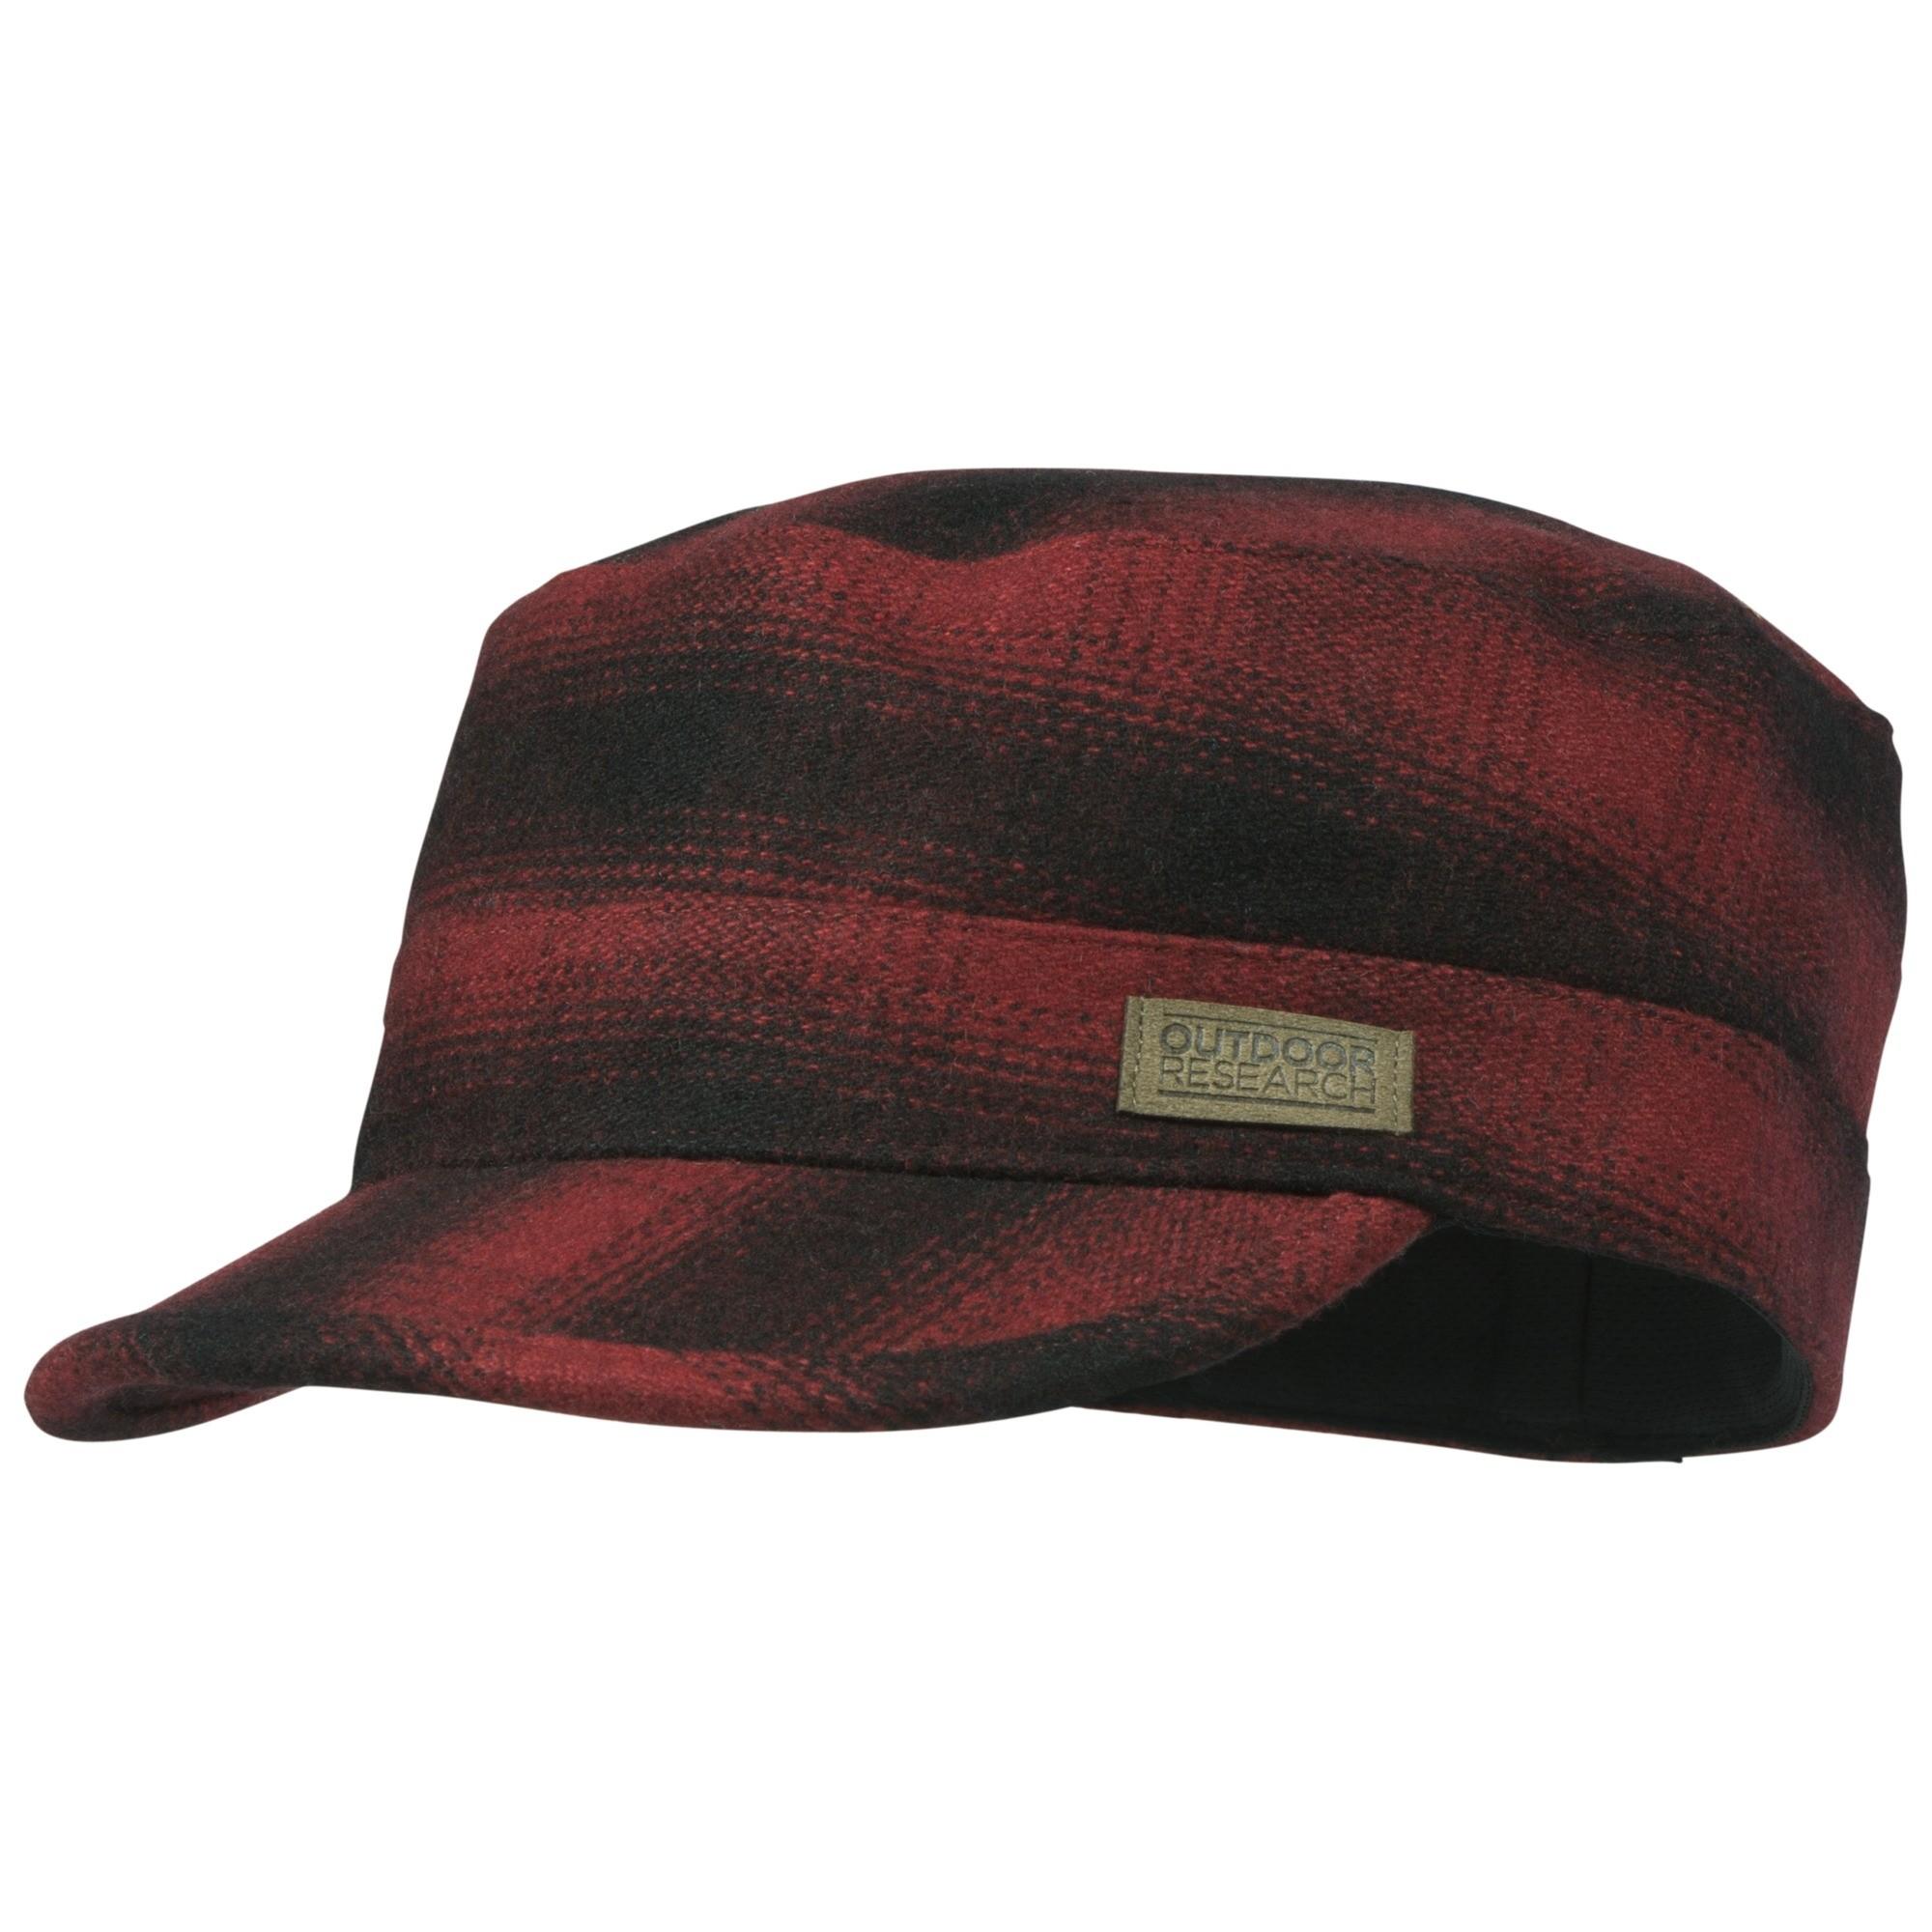 Outdoor Research Kettle Cap - Redwood /Black